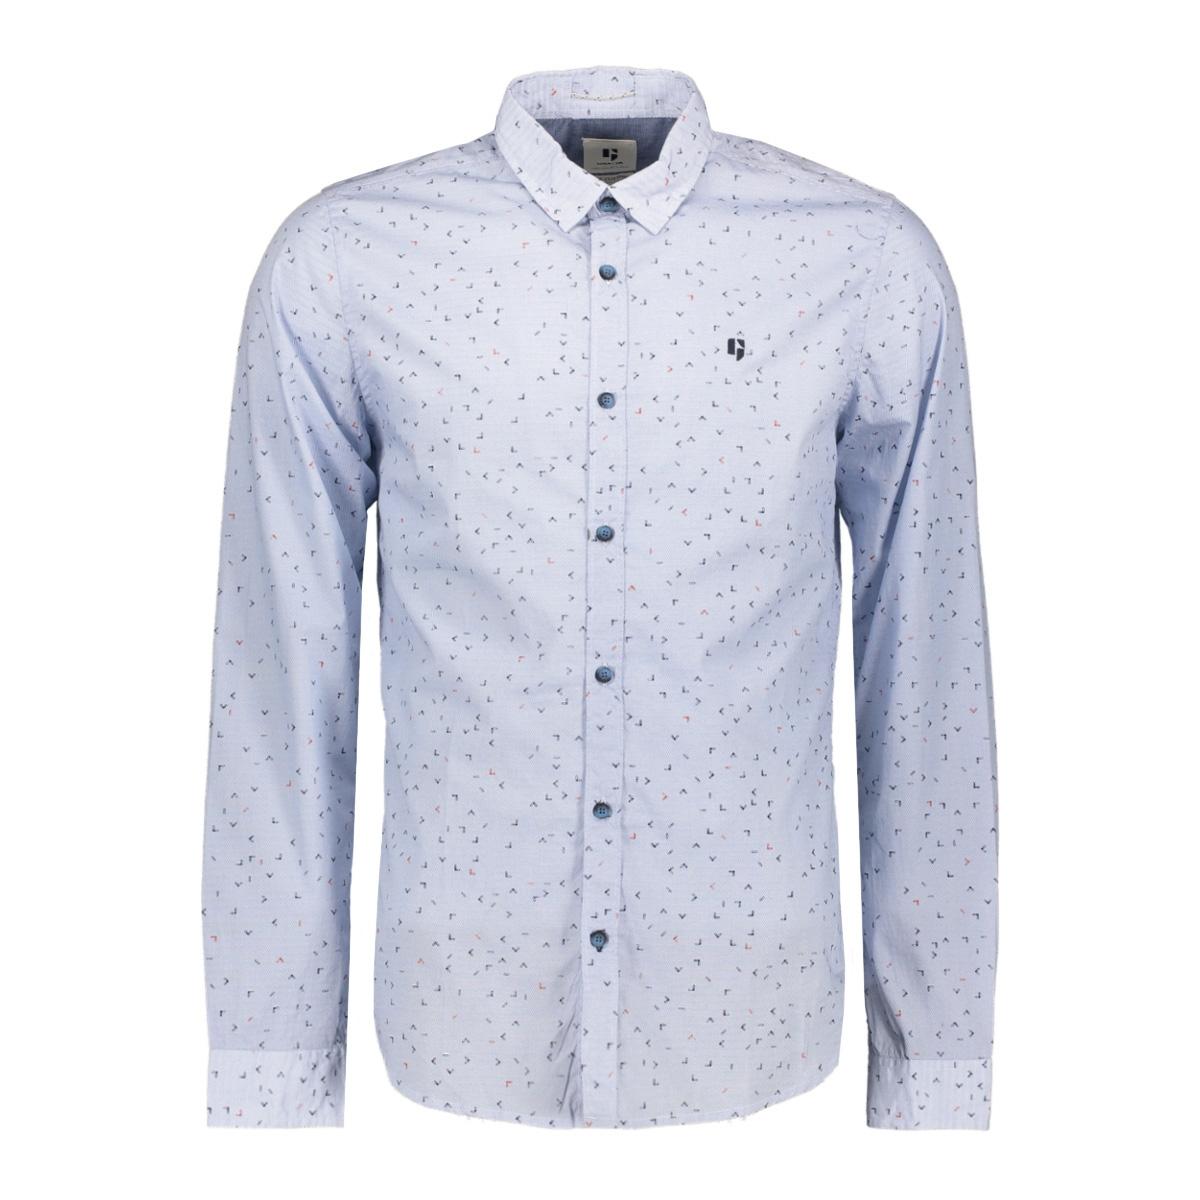 a91026 garcia overhemd 50 white